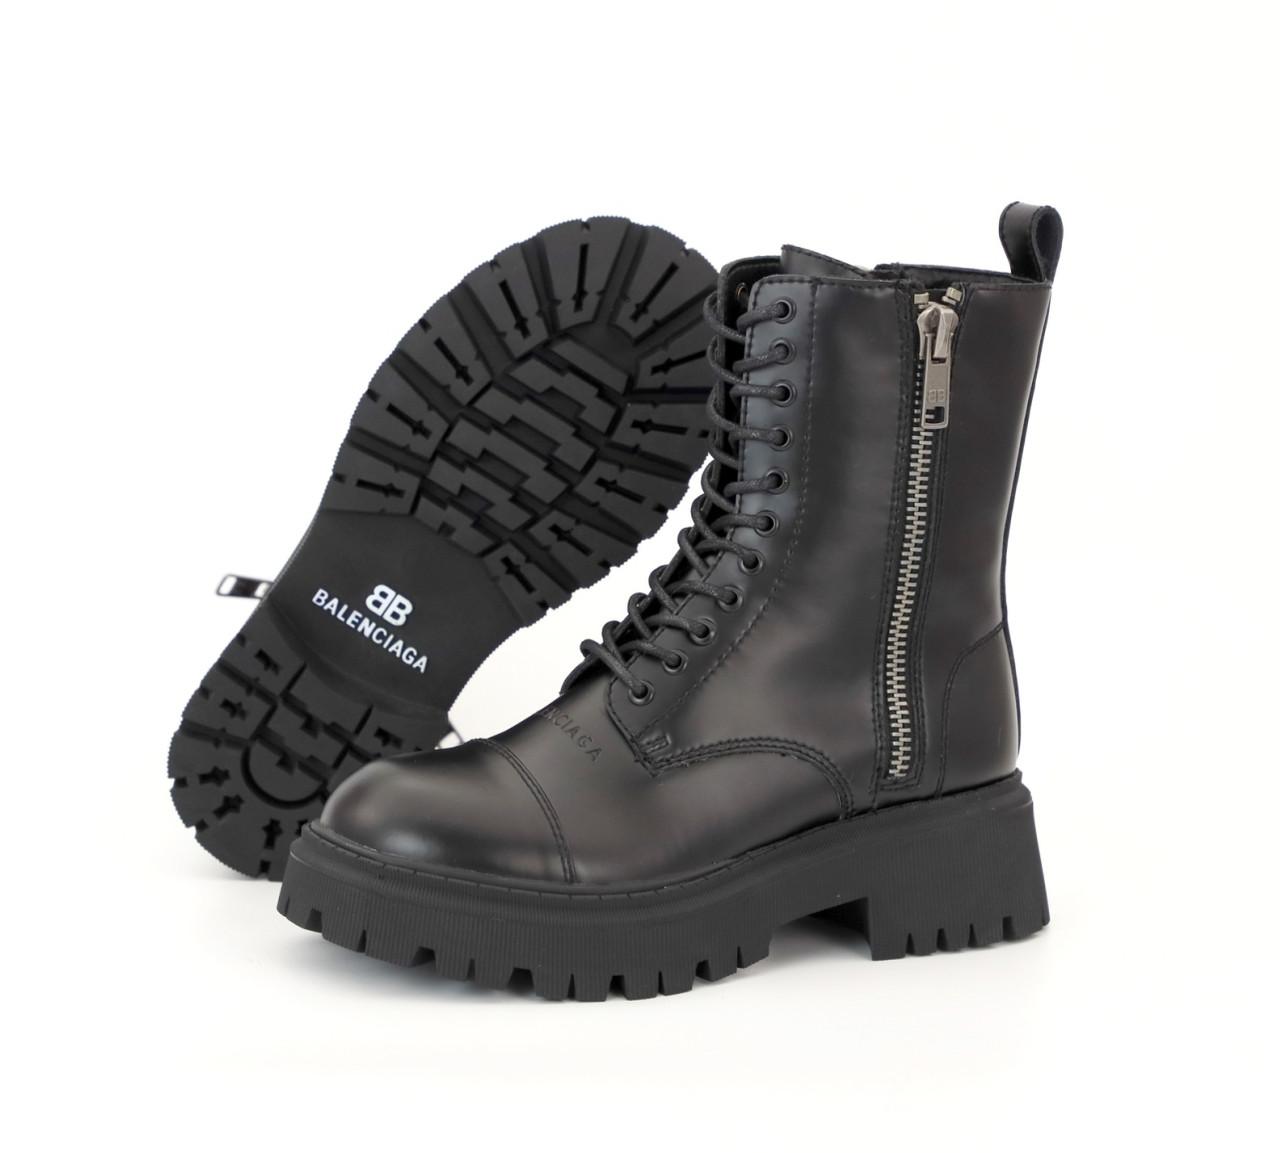 Зимние женские ботинки Balenciaga Tractor. ТОП Реплика ААА класса.